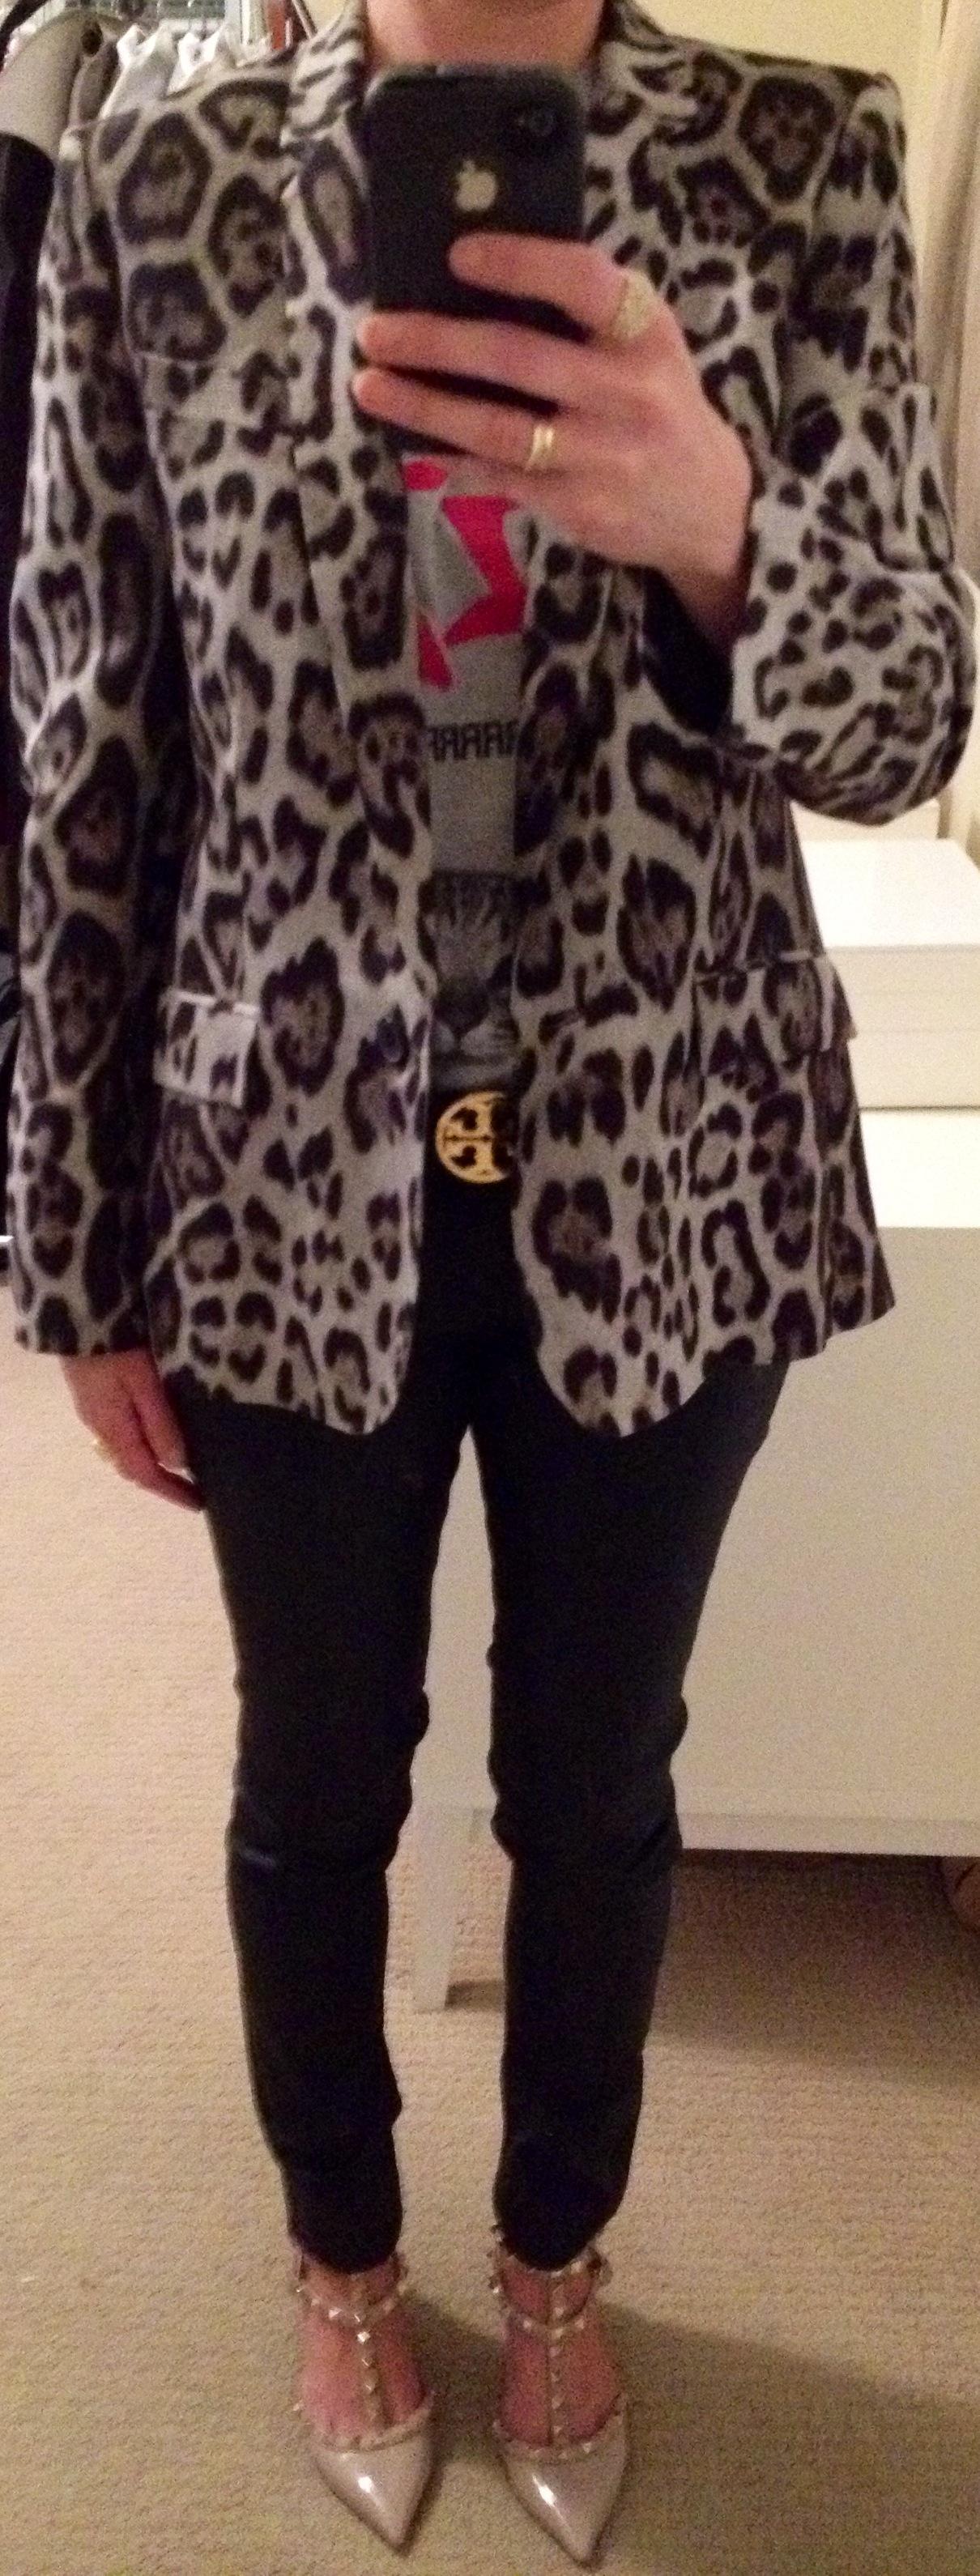 Aug 15, Meow! Leopard Jacket over Kitty Tee from Zara